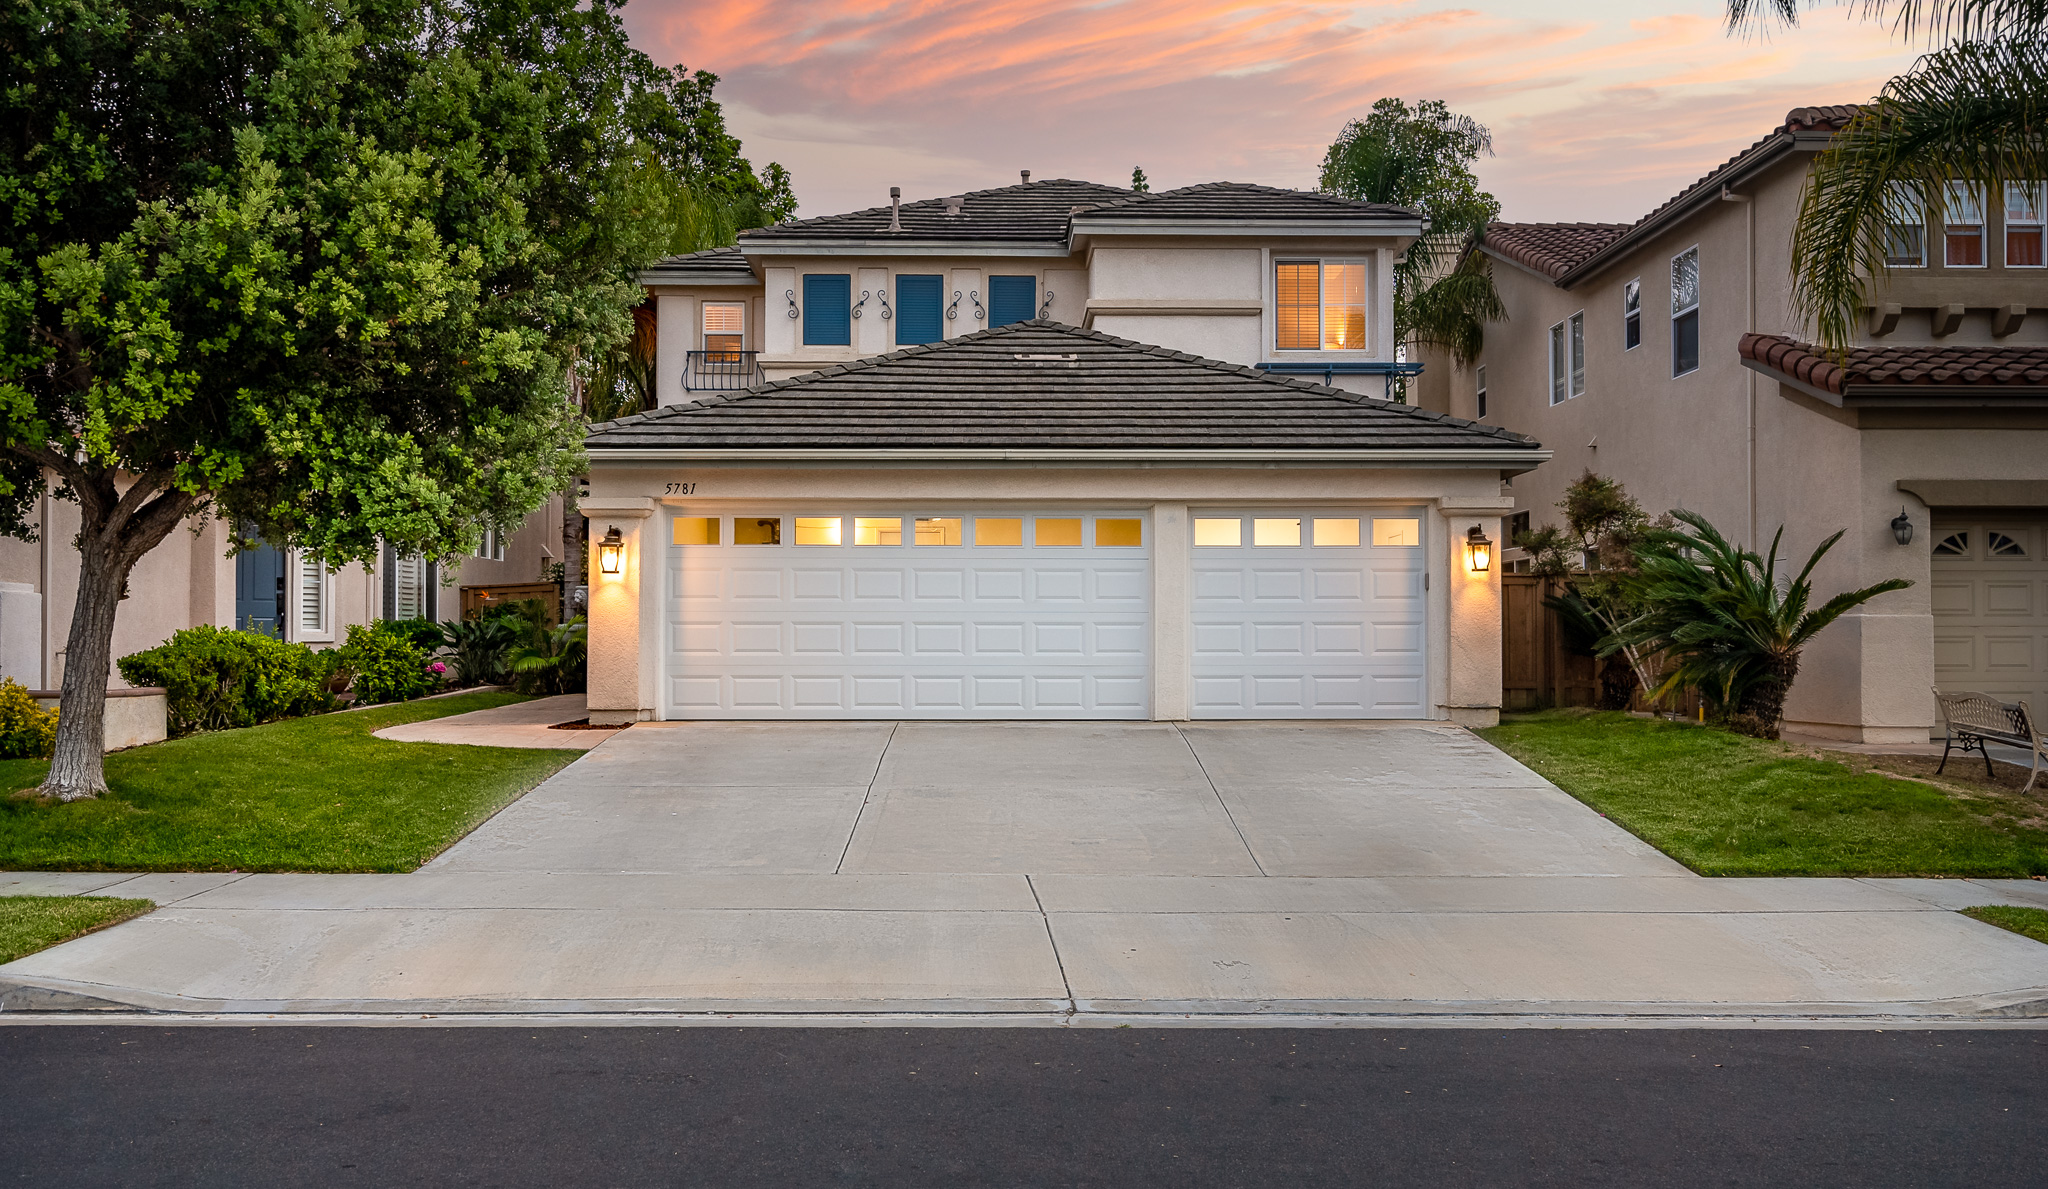 5781 Concord Woods Way -  San Diego, CA 92130